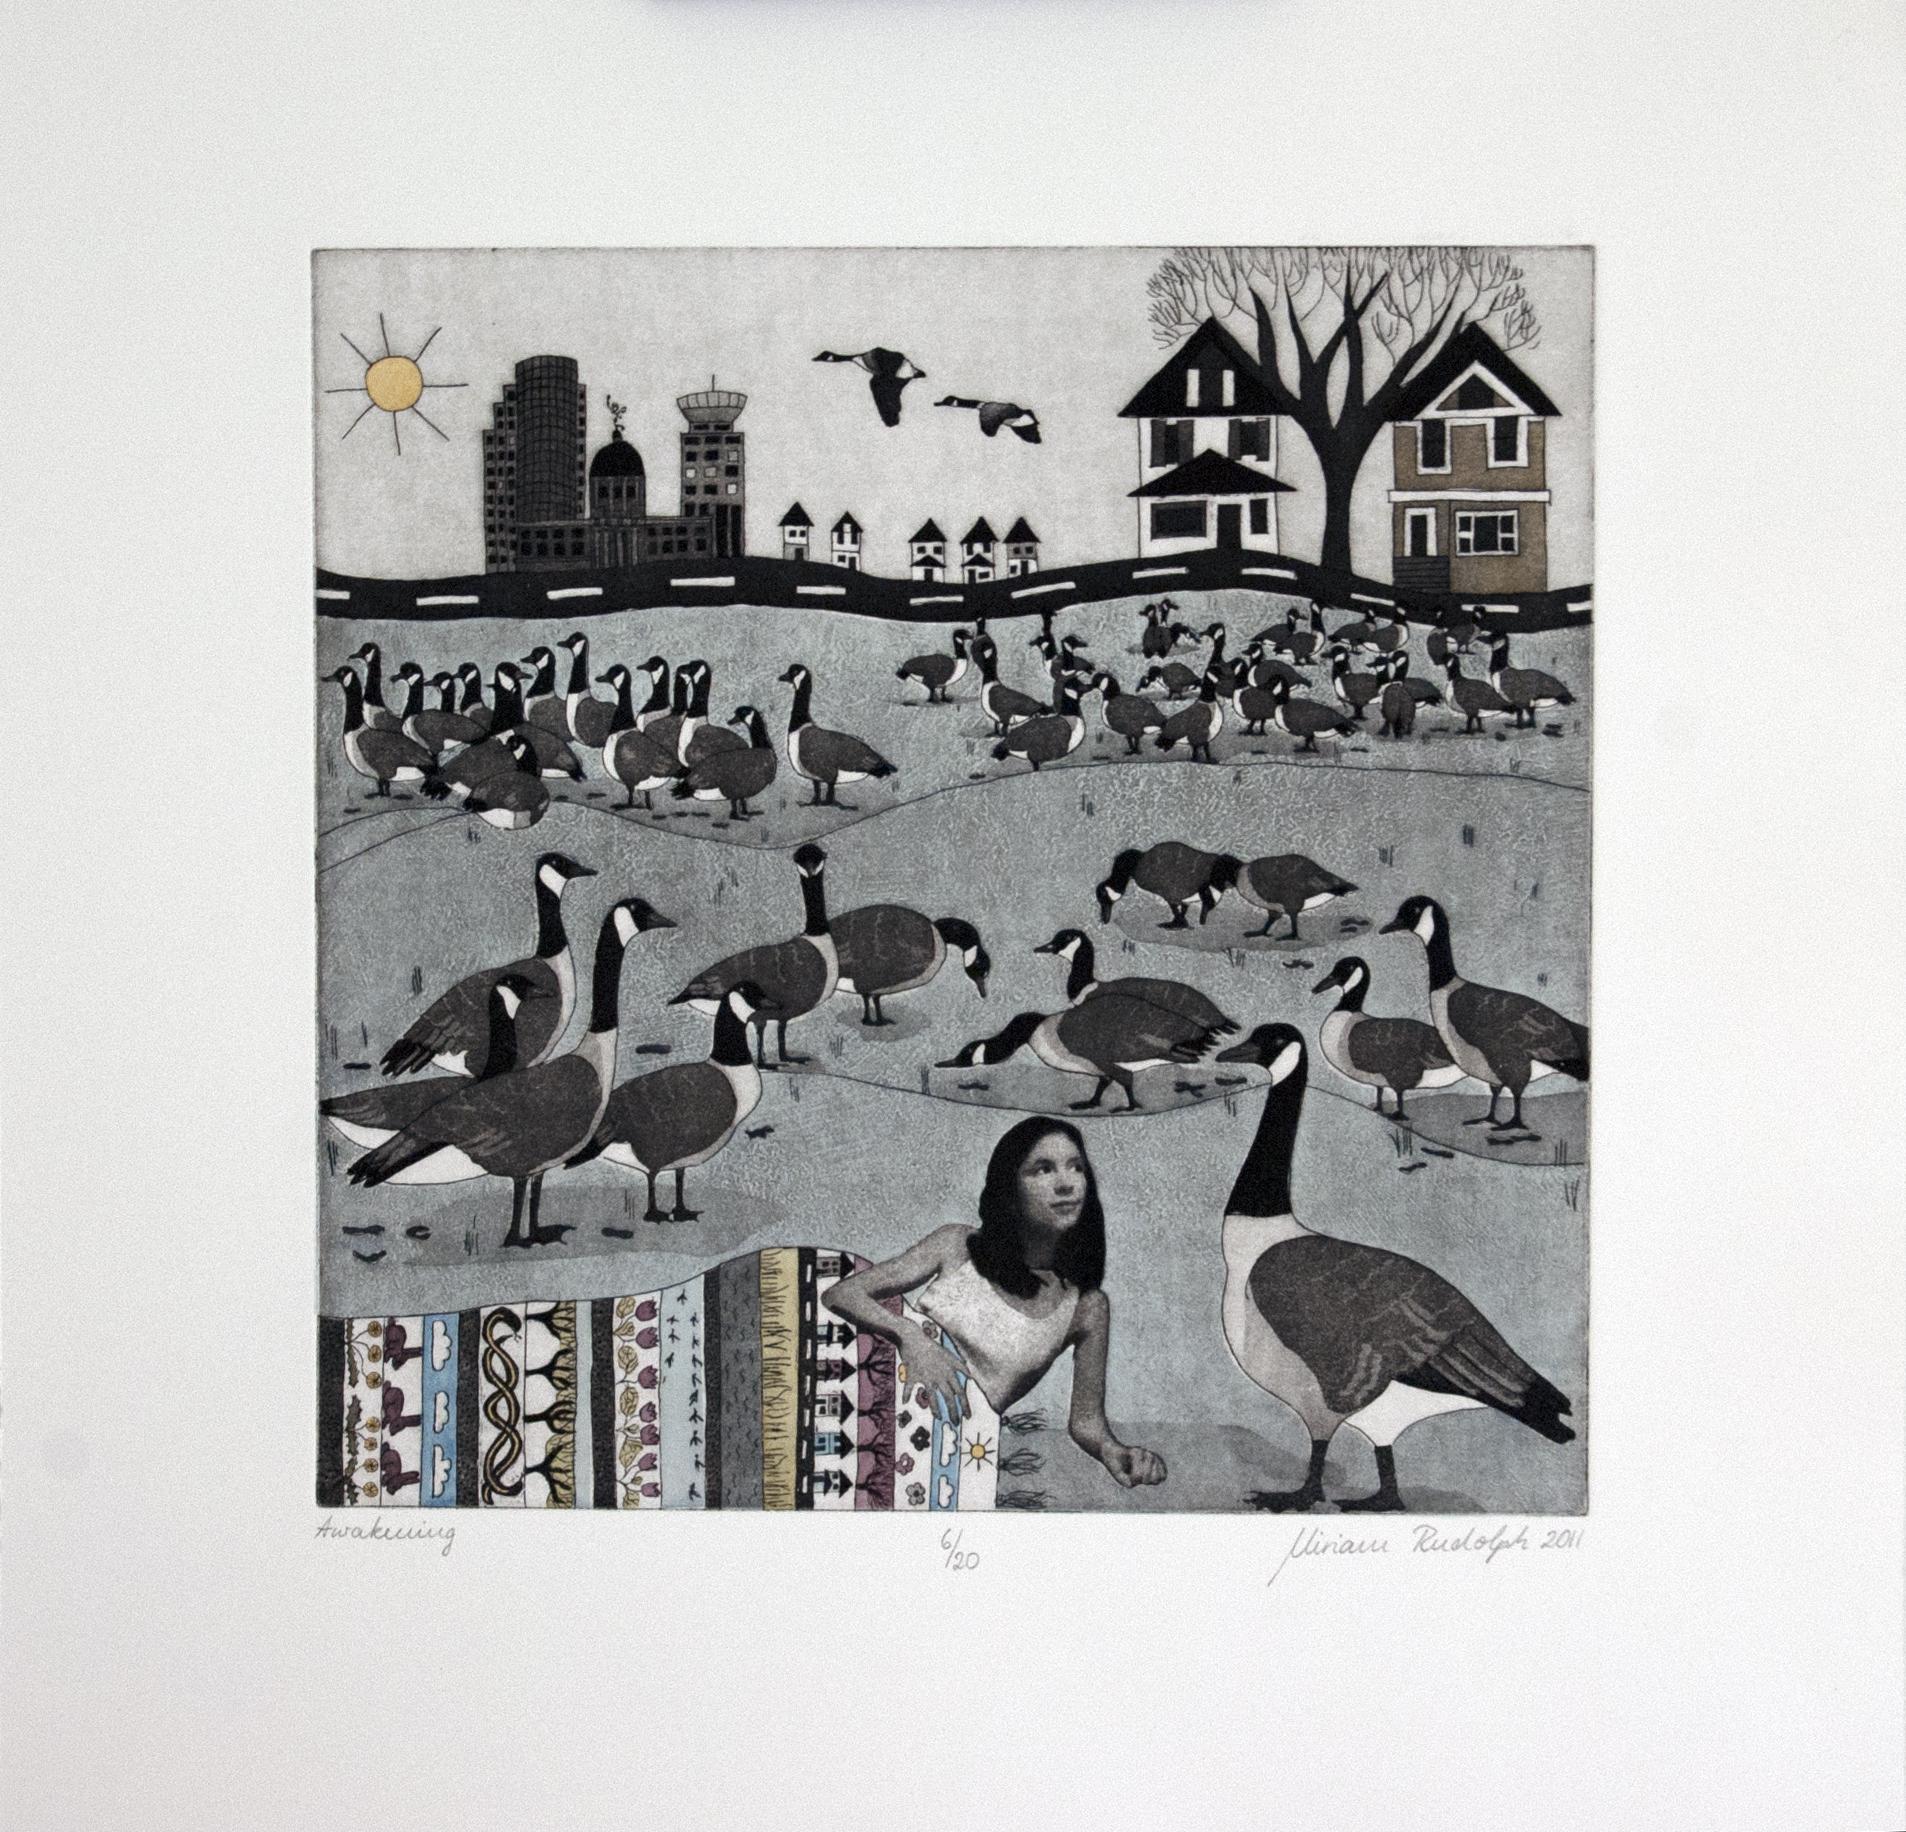 Awakening, Etching screenprint handcolored printed on pescia magnani paper, 30 x 30cm